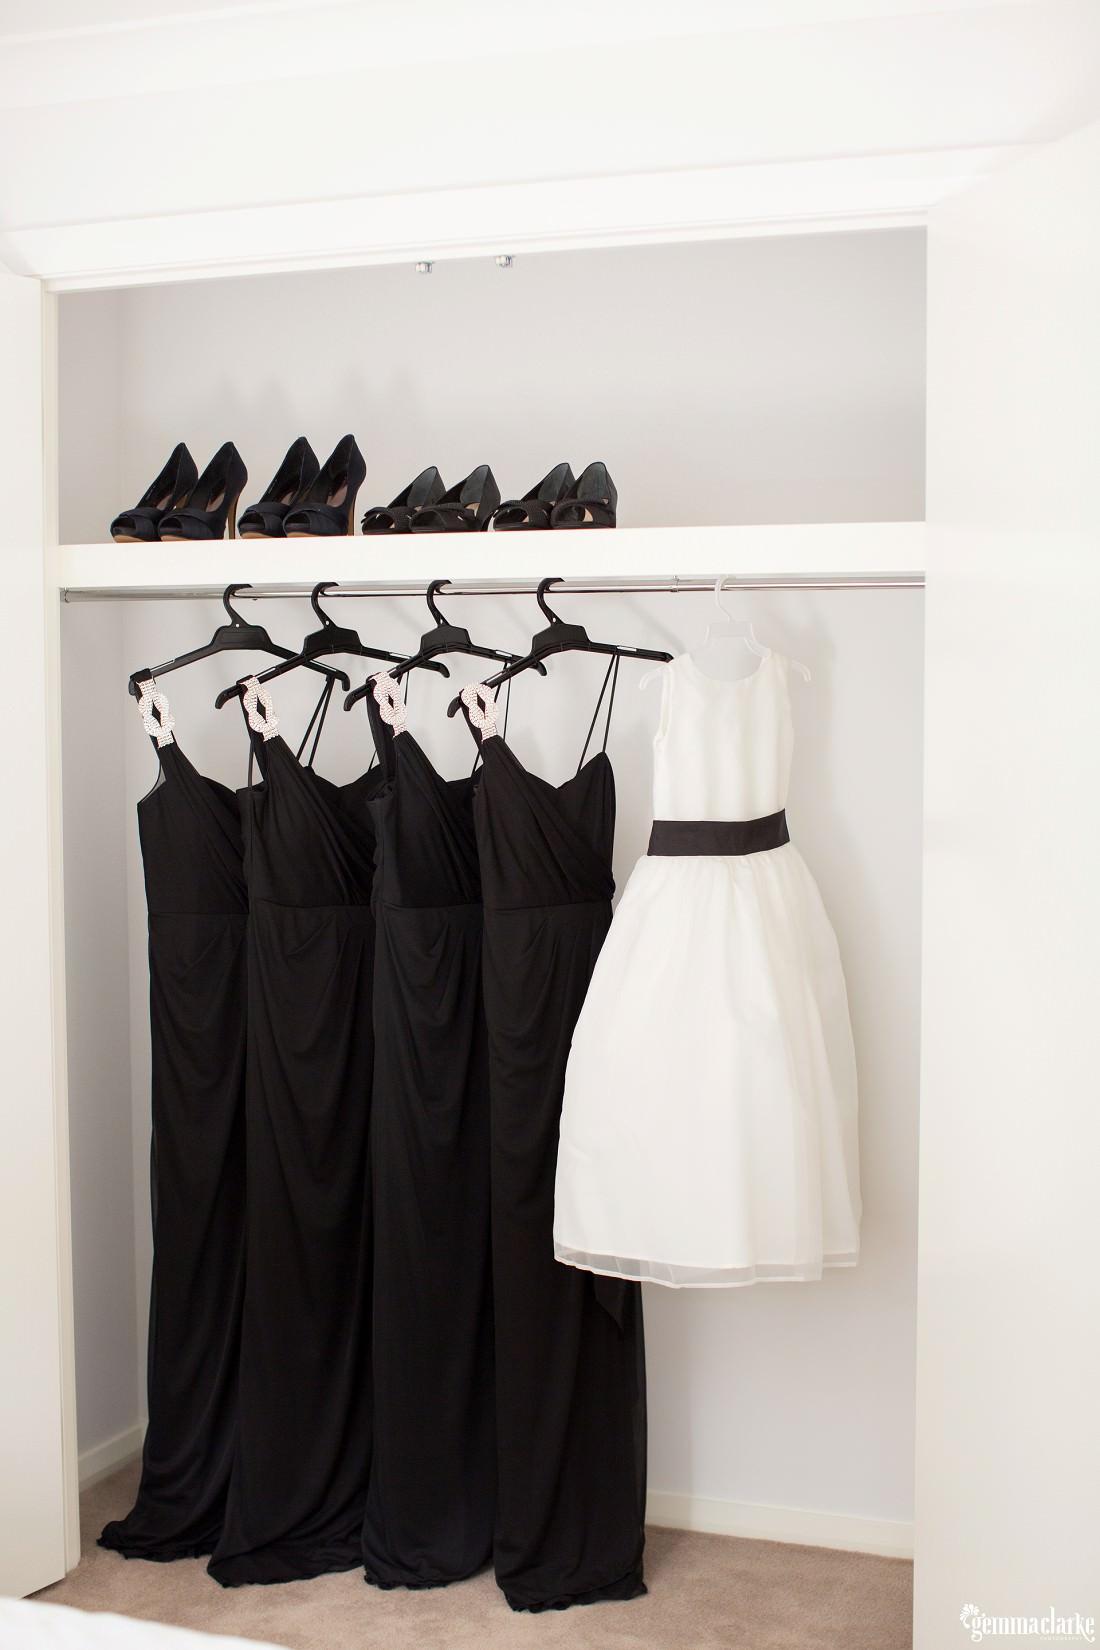 gemma-clarke-photography_gunners-barracks-wedding_tearooms-wedding_ellie-and-sam_0004